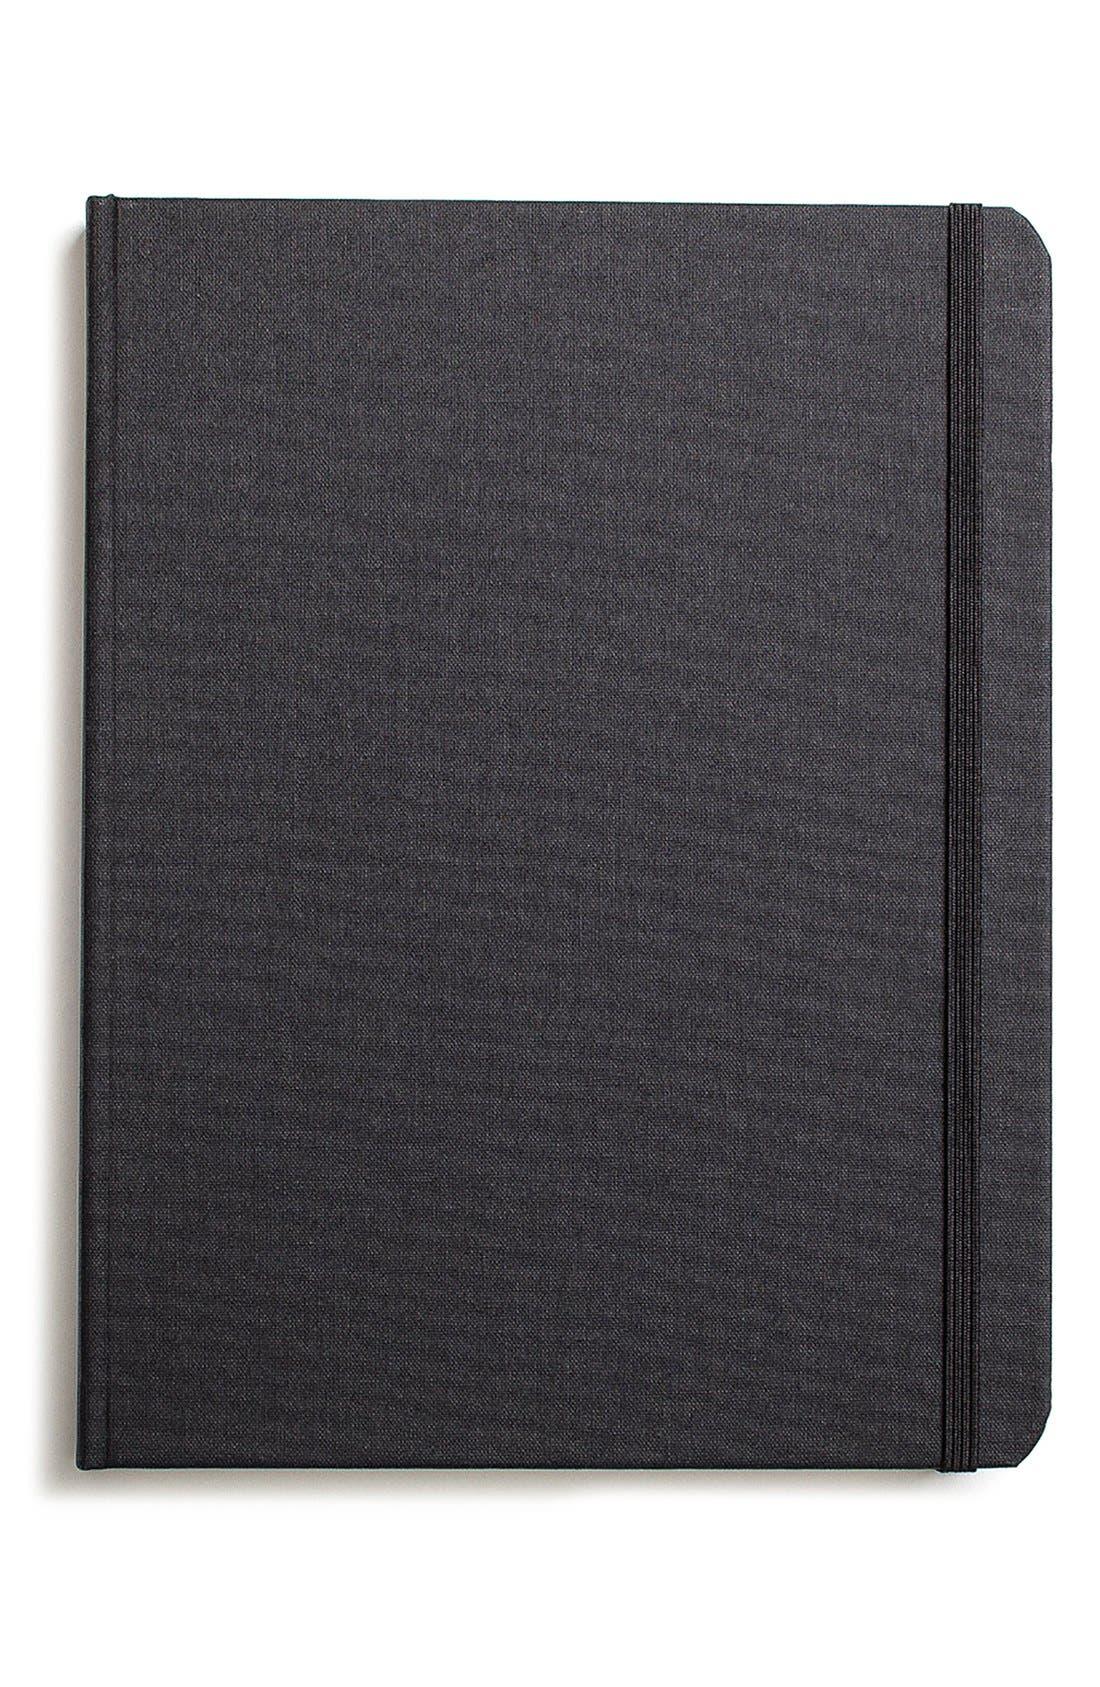 Hardcover Linen Journal,                         Main,                         color, JET BLACK